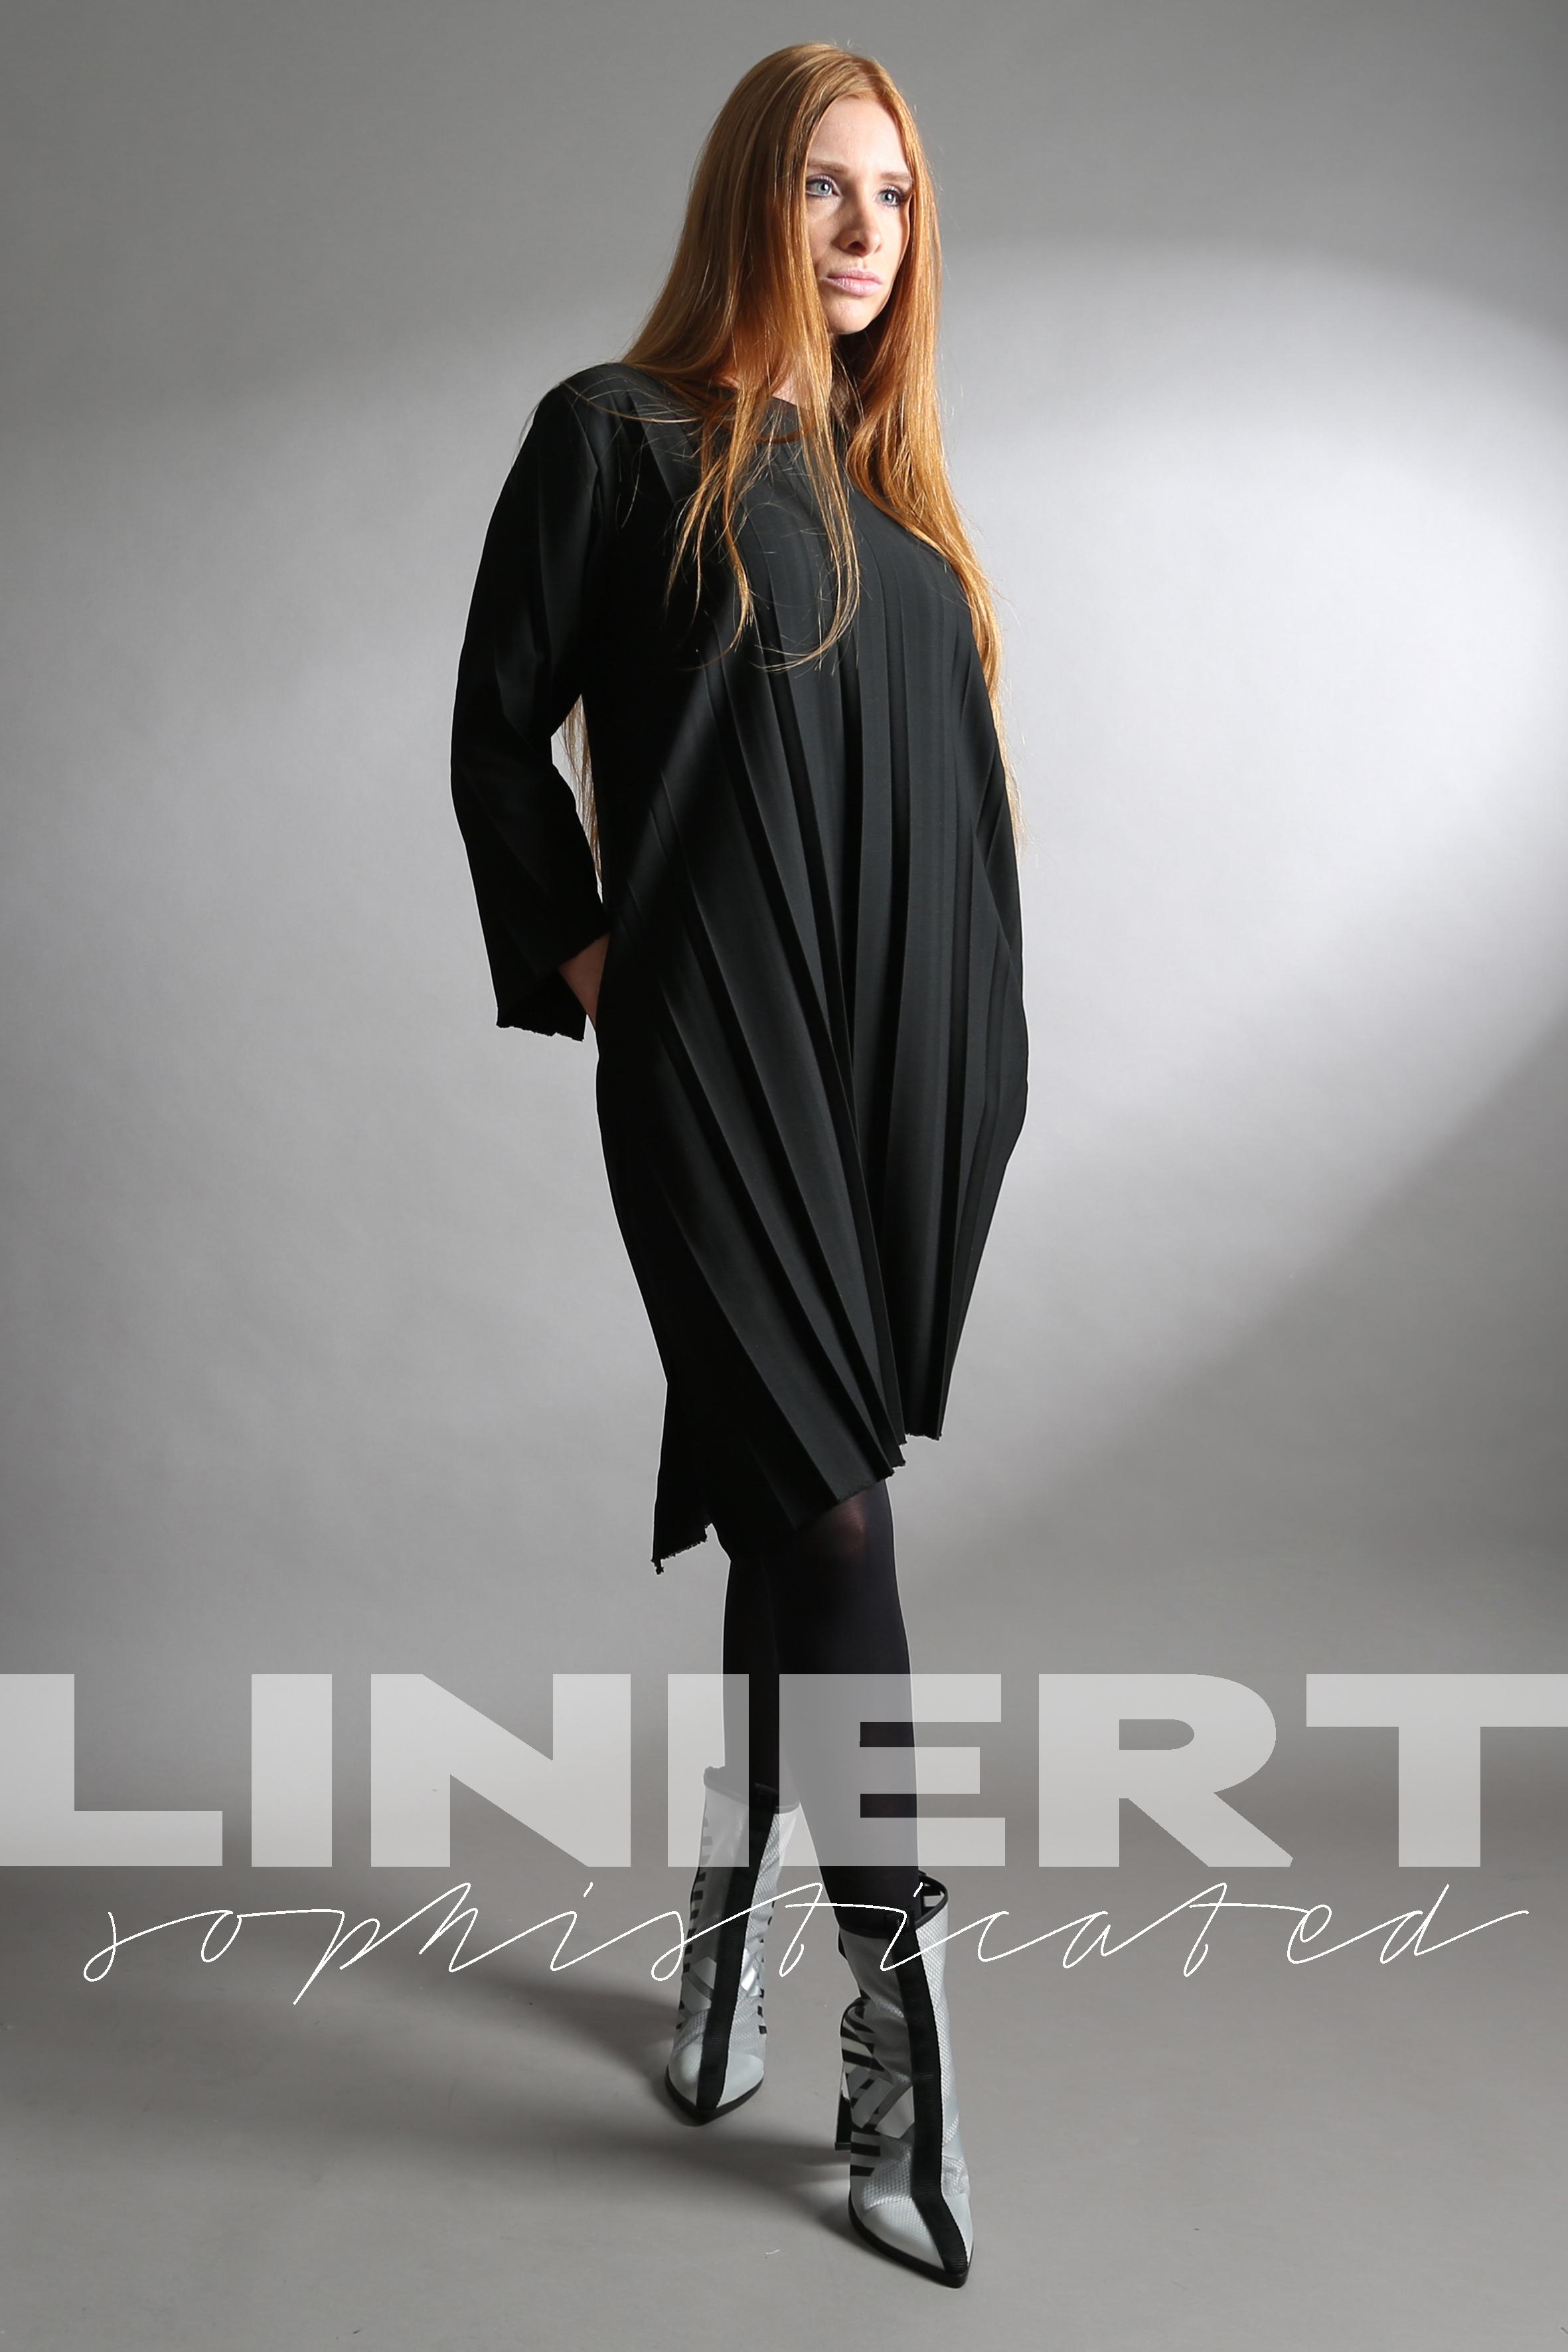 MQVFW19 Liniert © Liniert